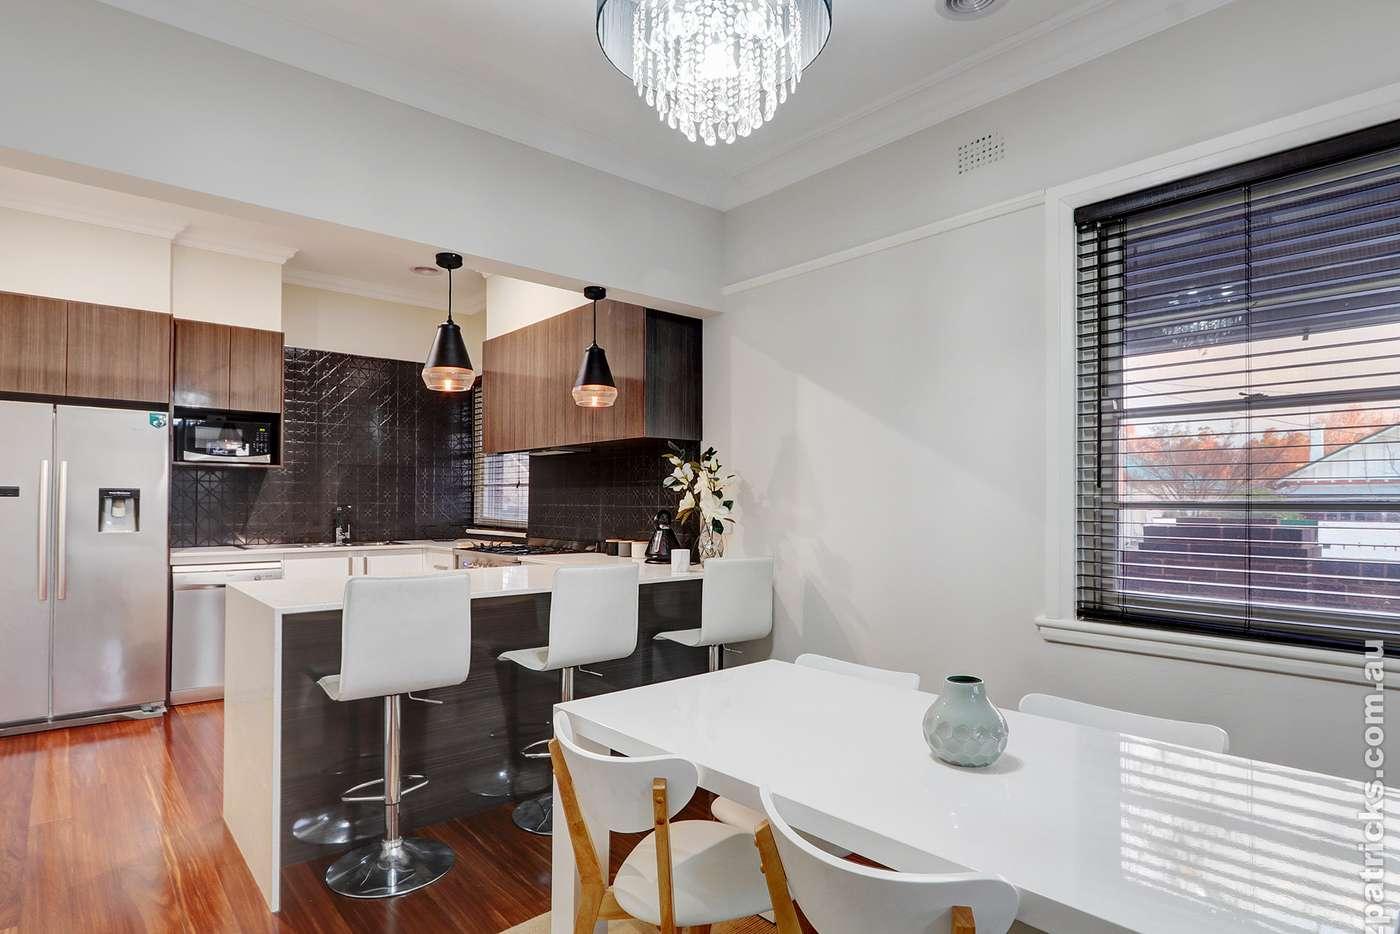 Main view of Homely house listing, 27 Dobbs Street, Wagga Wagga NSW 2650